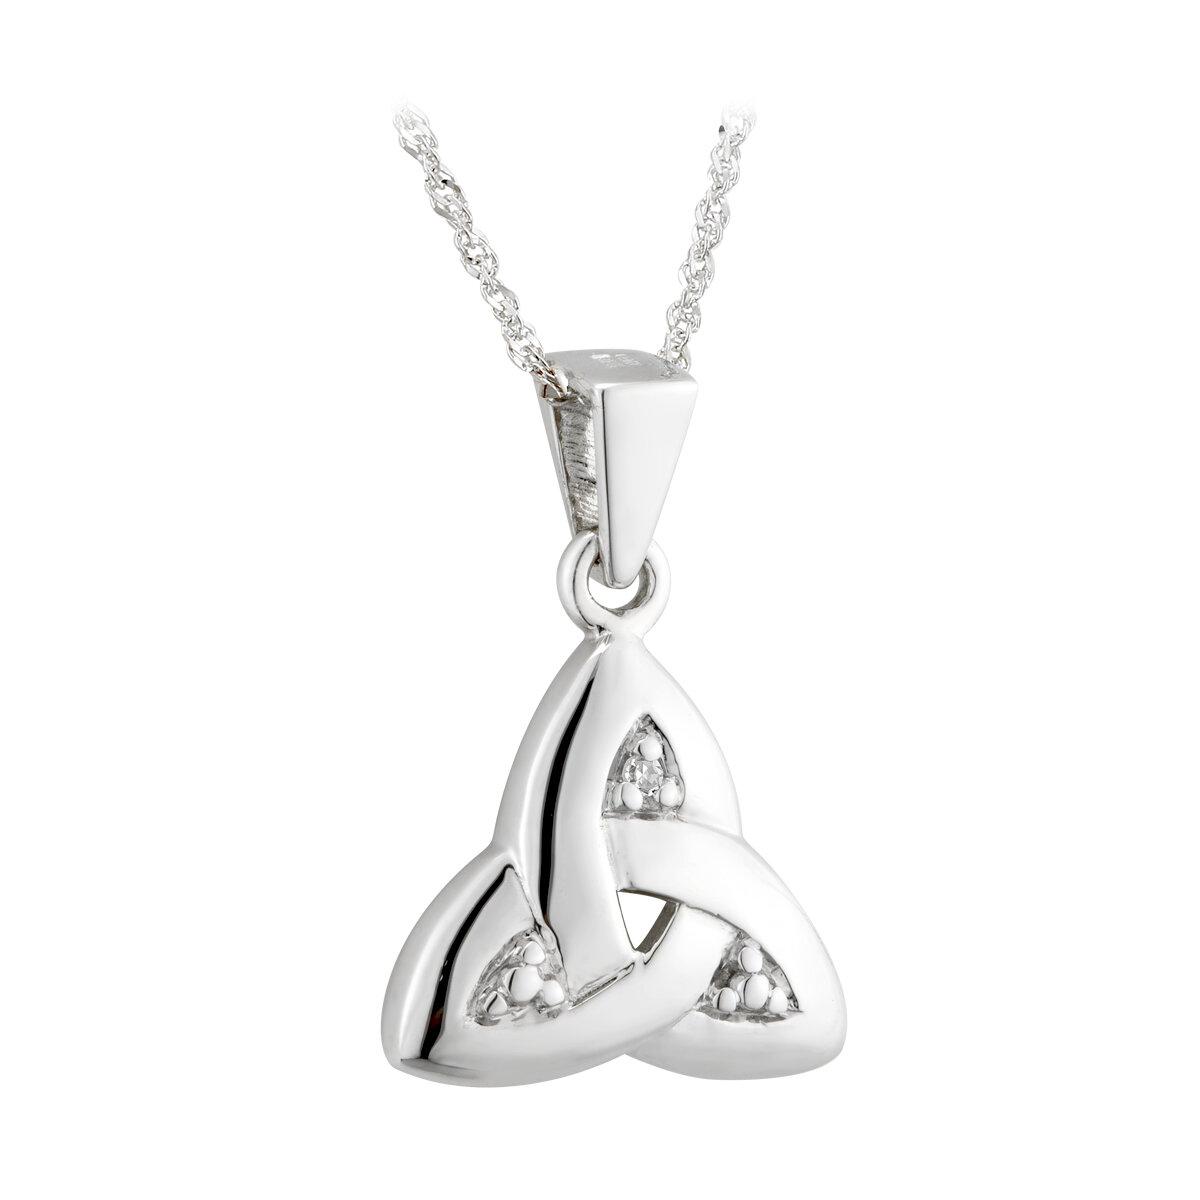 14k white gold diamond trinity knot pendant s4718 from Solvar